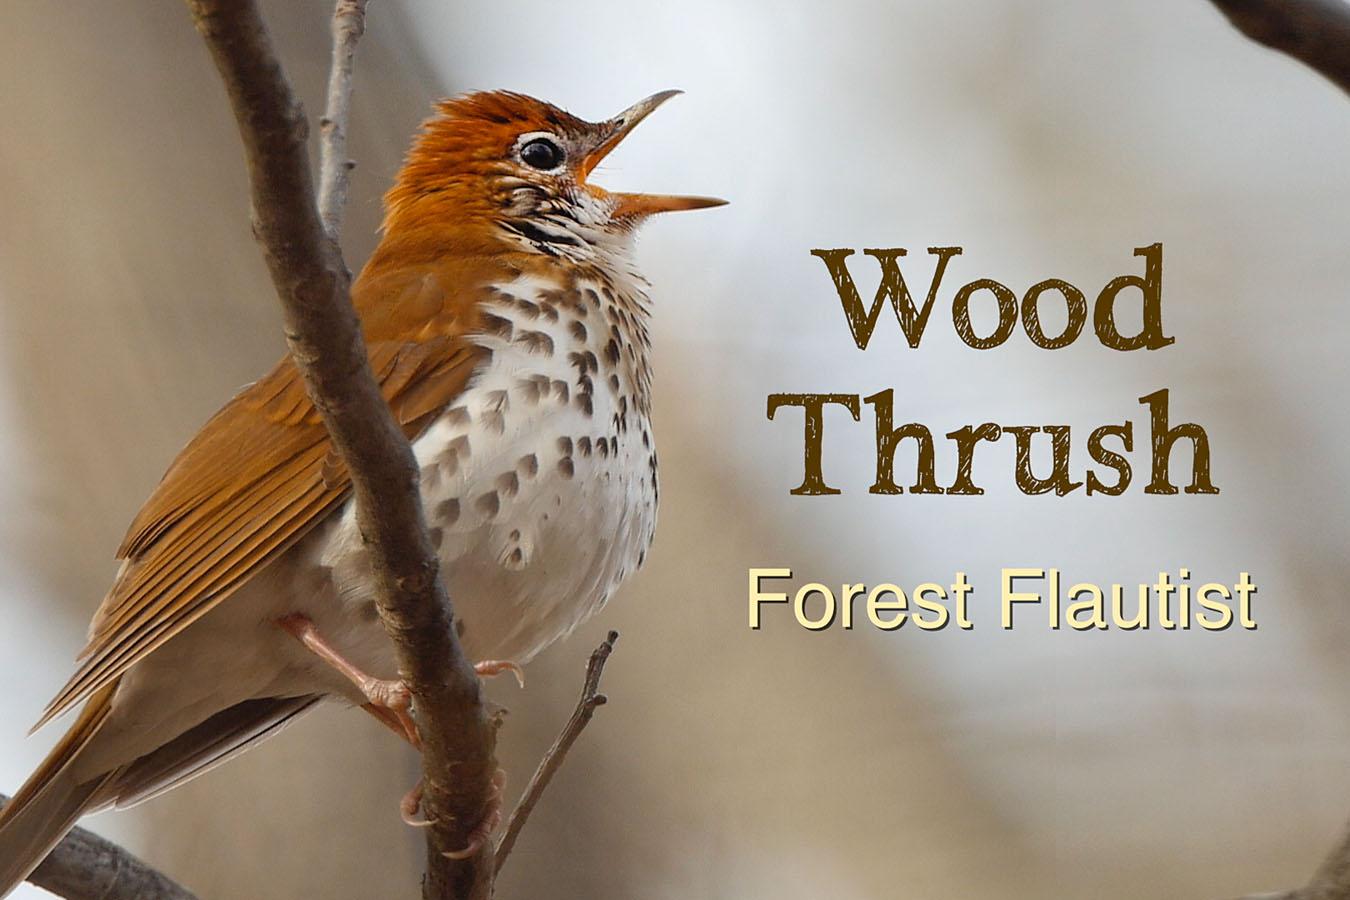 Wood Thrush - featured image © Lang Elliott